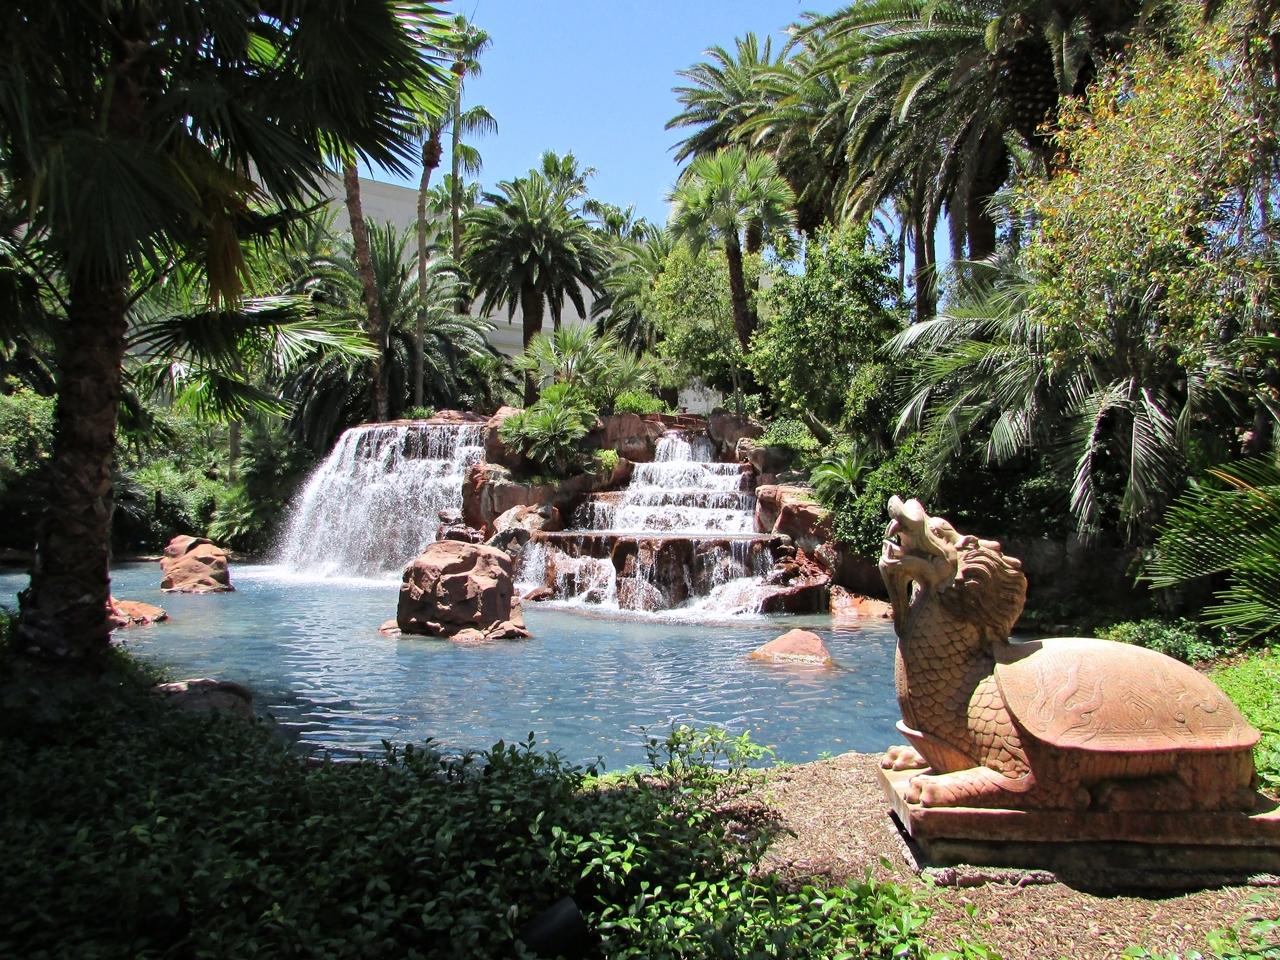 USA Rundreise - Amerika Westküste - Las Vegas Mirage Garden - Fashionladyloves